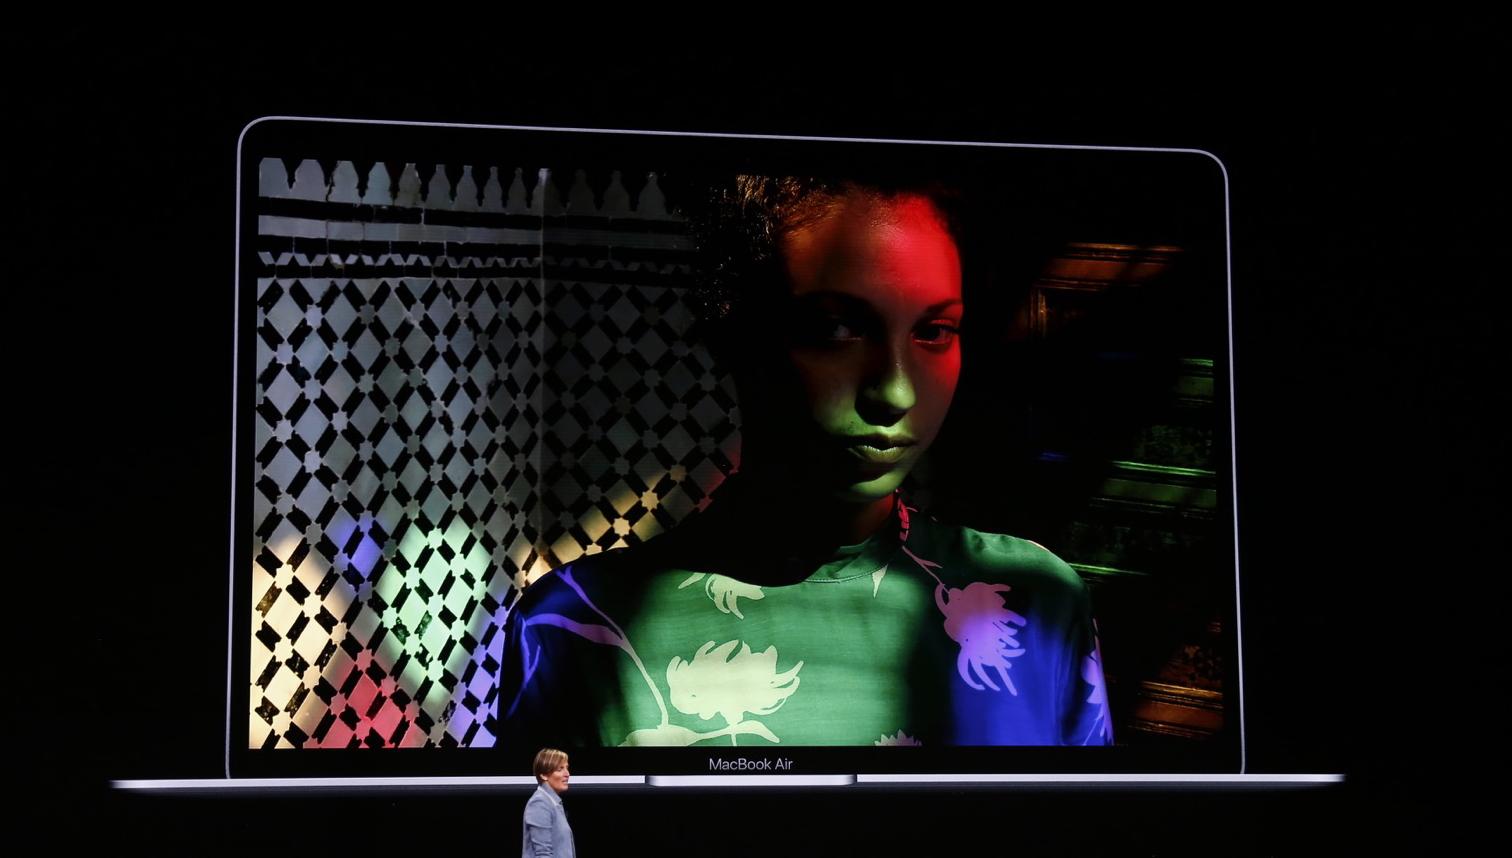 FaceTime macbook air - مؤتمر آبل: آبل تعلن رسمياً عن الجهاز الجديد MacBook Air ببطارية تدوم 13 ساعة